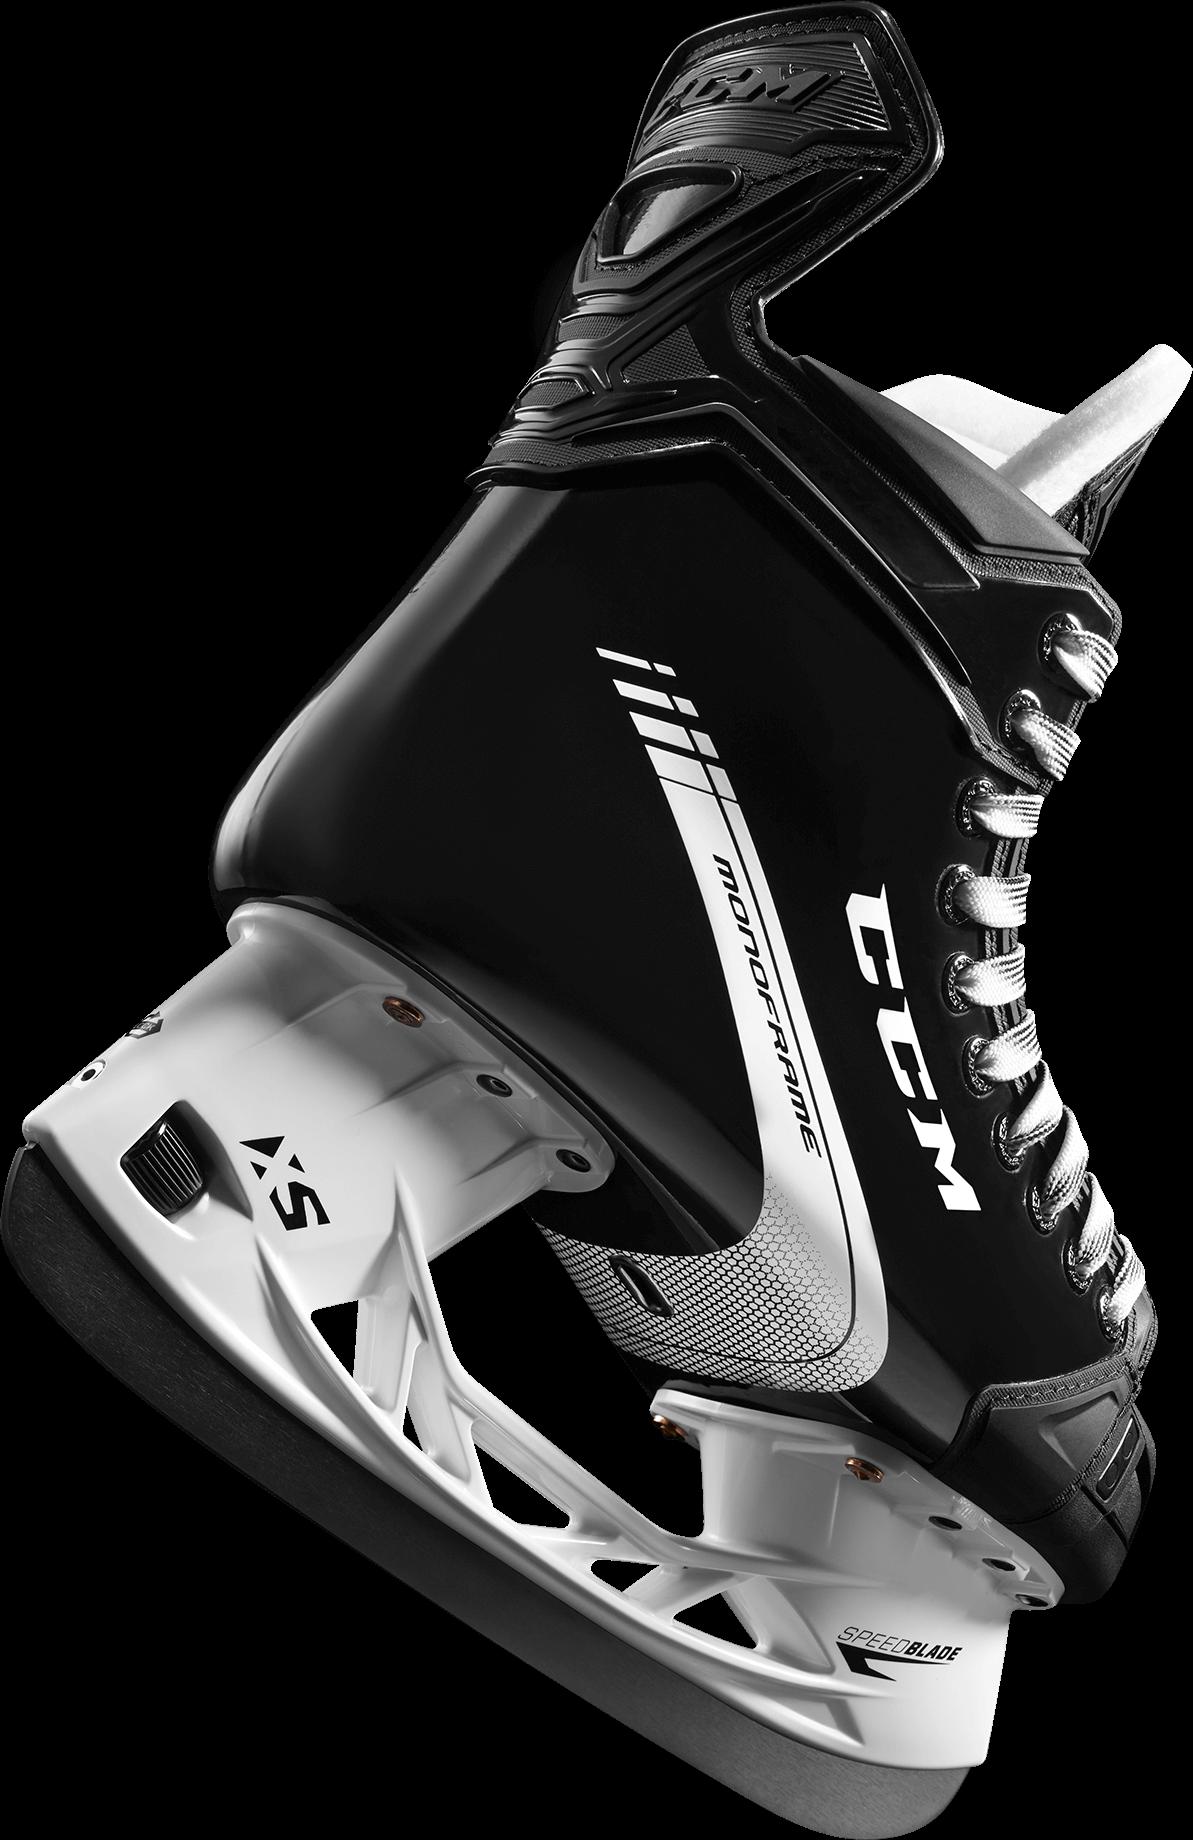 Transparent pair of ice skates clipart - Ccm One Piece Skates